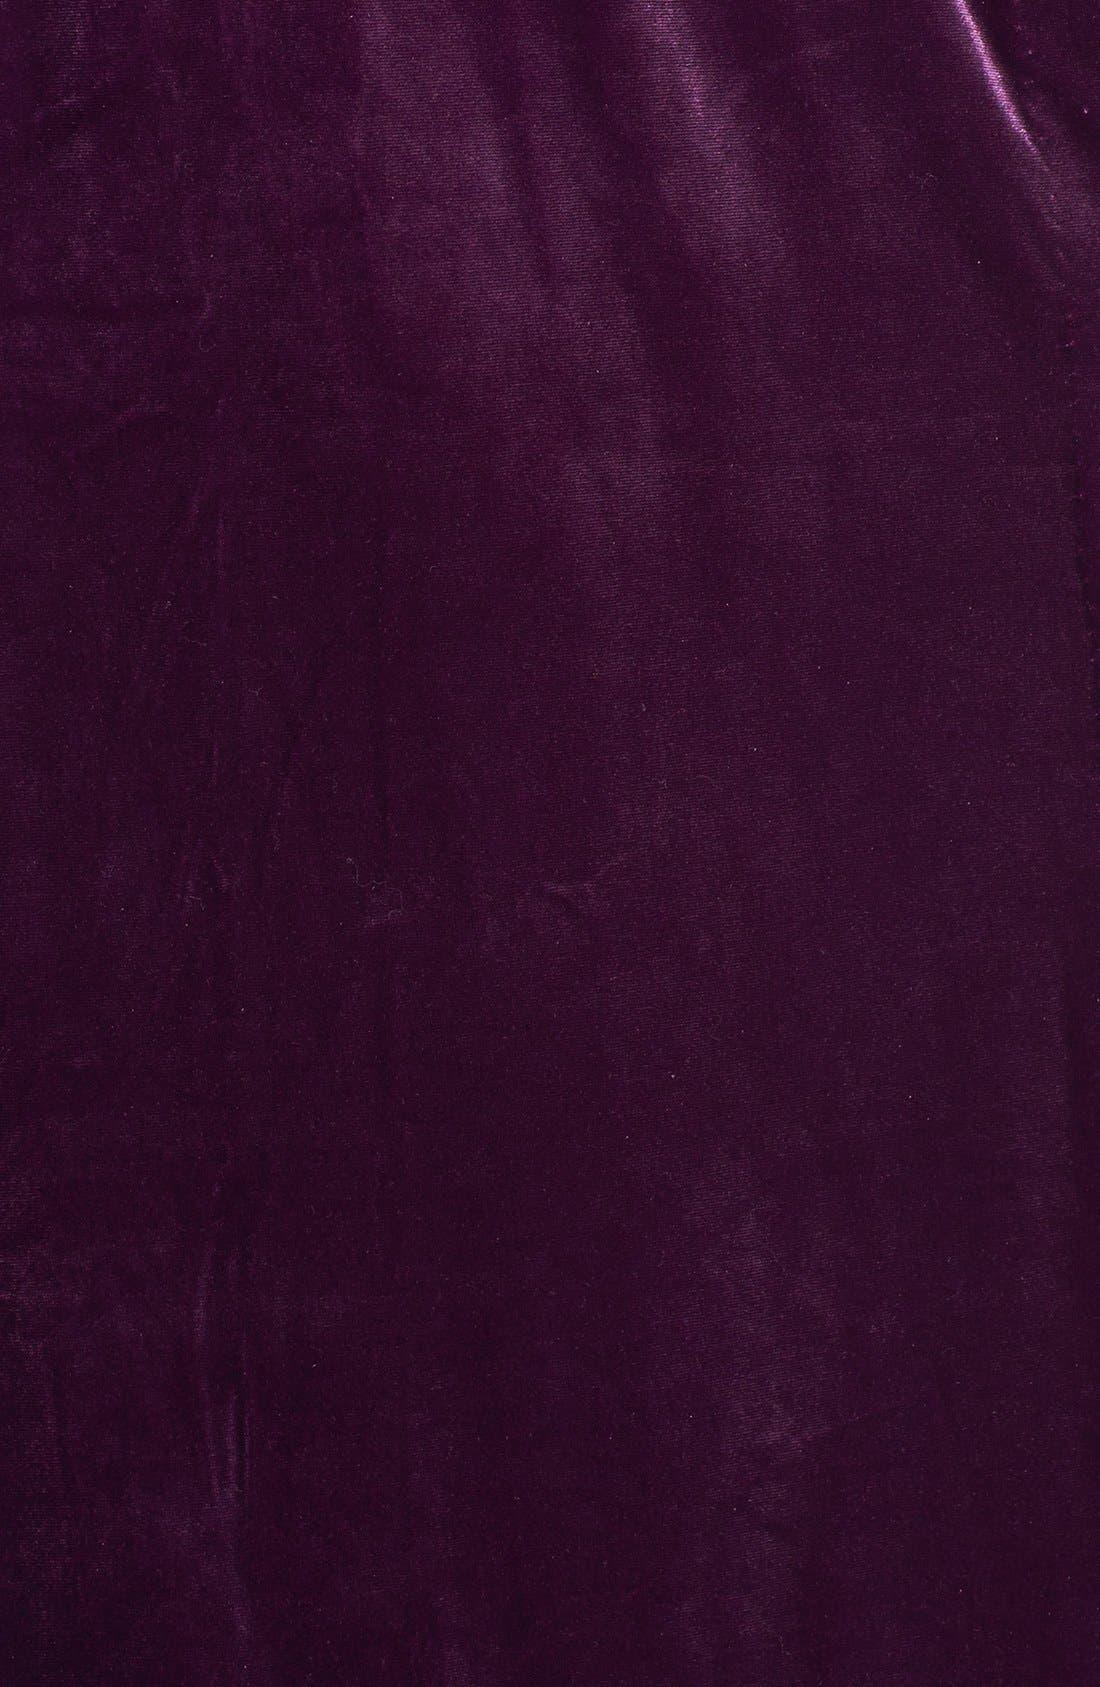 Alternate Image 3  - Oscar de la Renta Sleepwear 'Zahara Nights' Velvet Robe